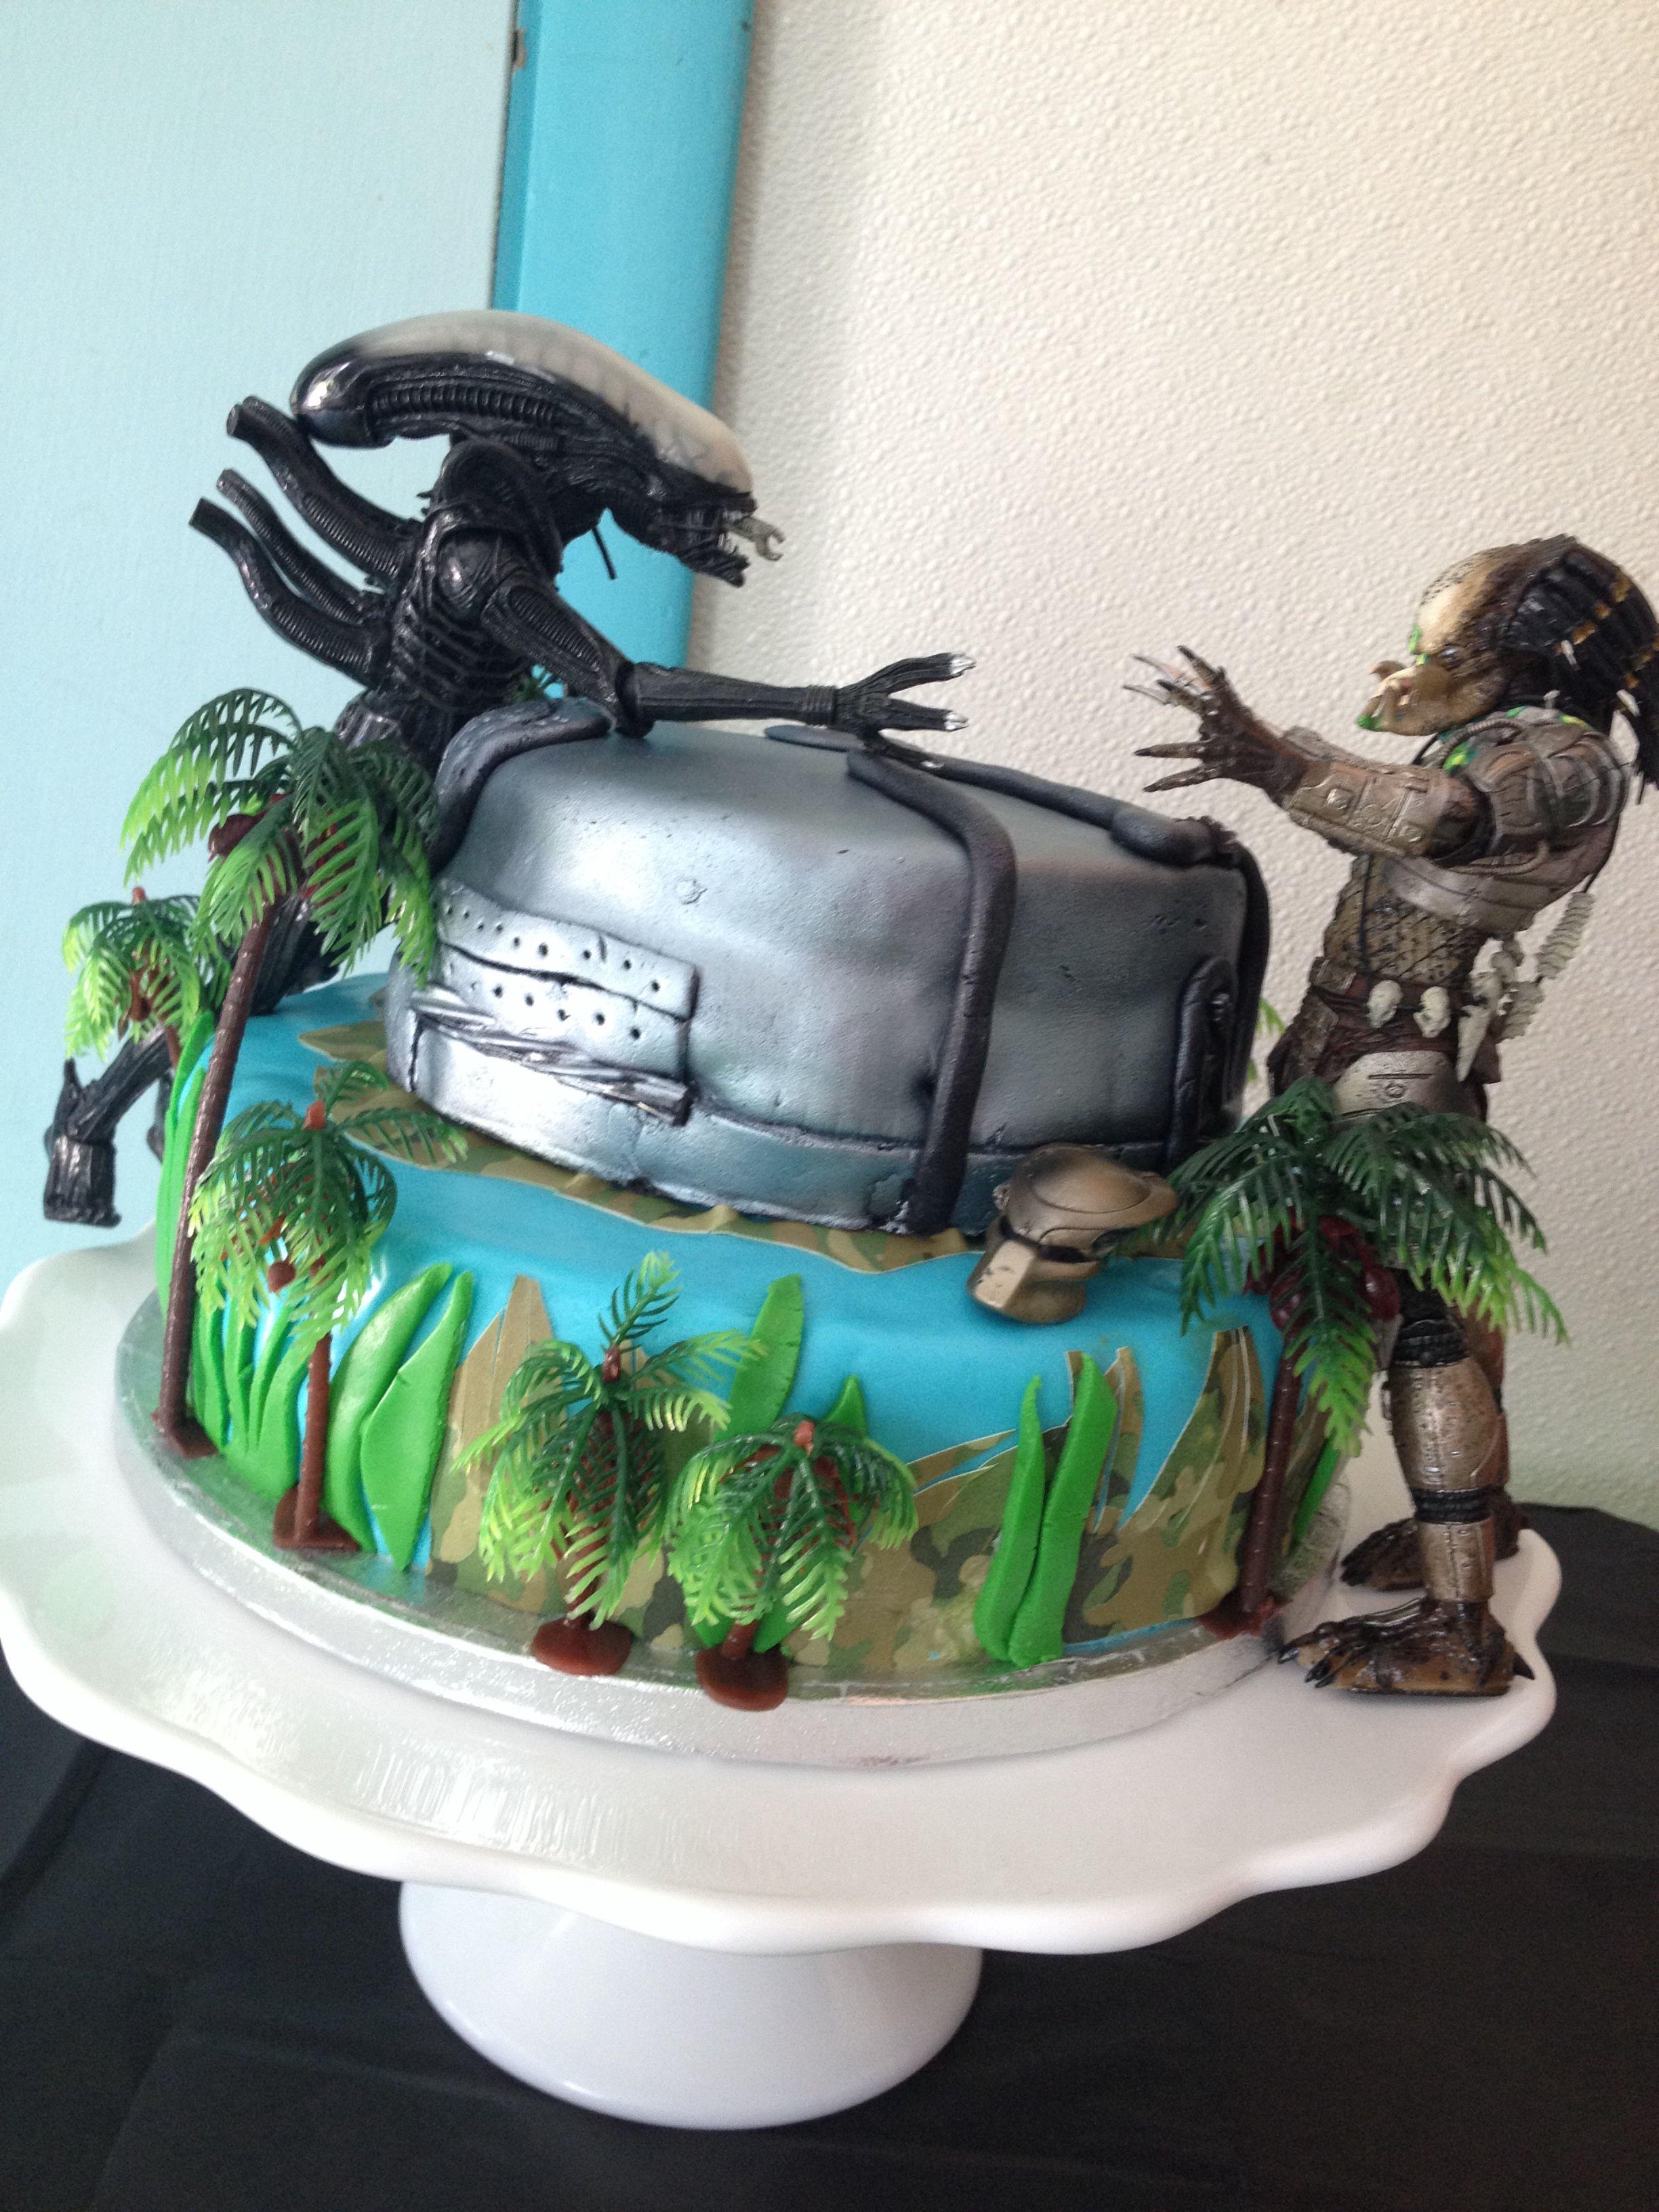 Alien Vs Predator Cake By Angela Fiandaca Decoracion De Pasteles